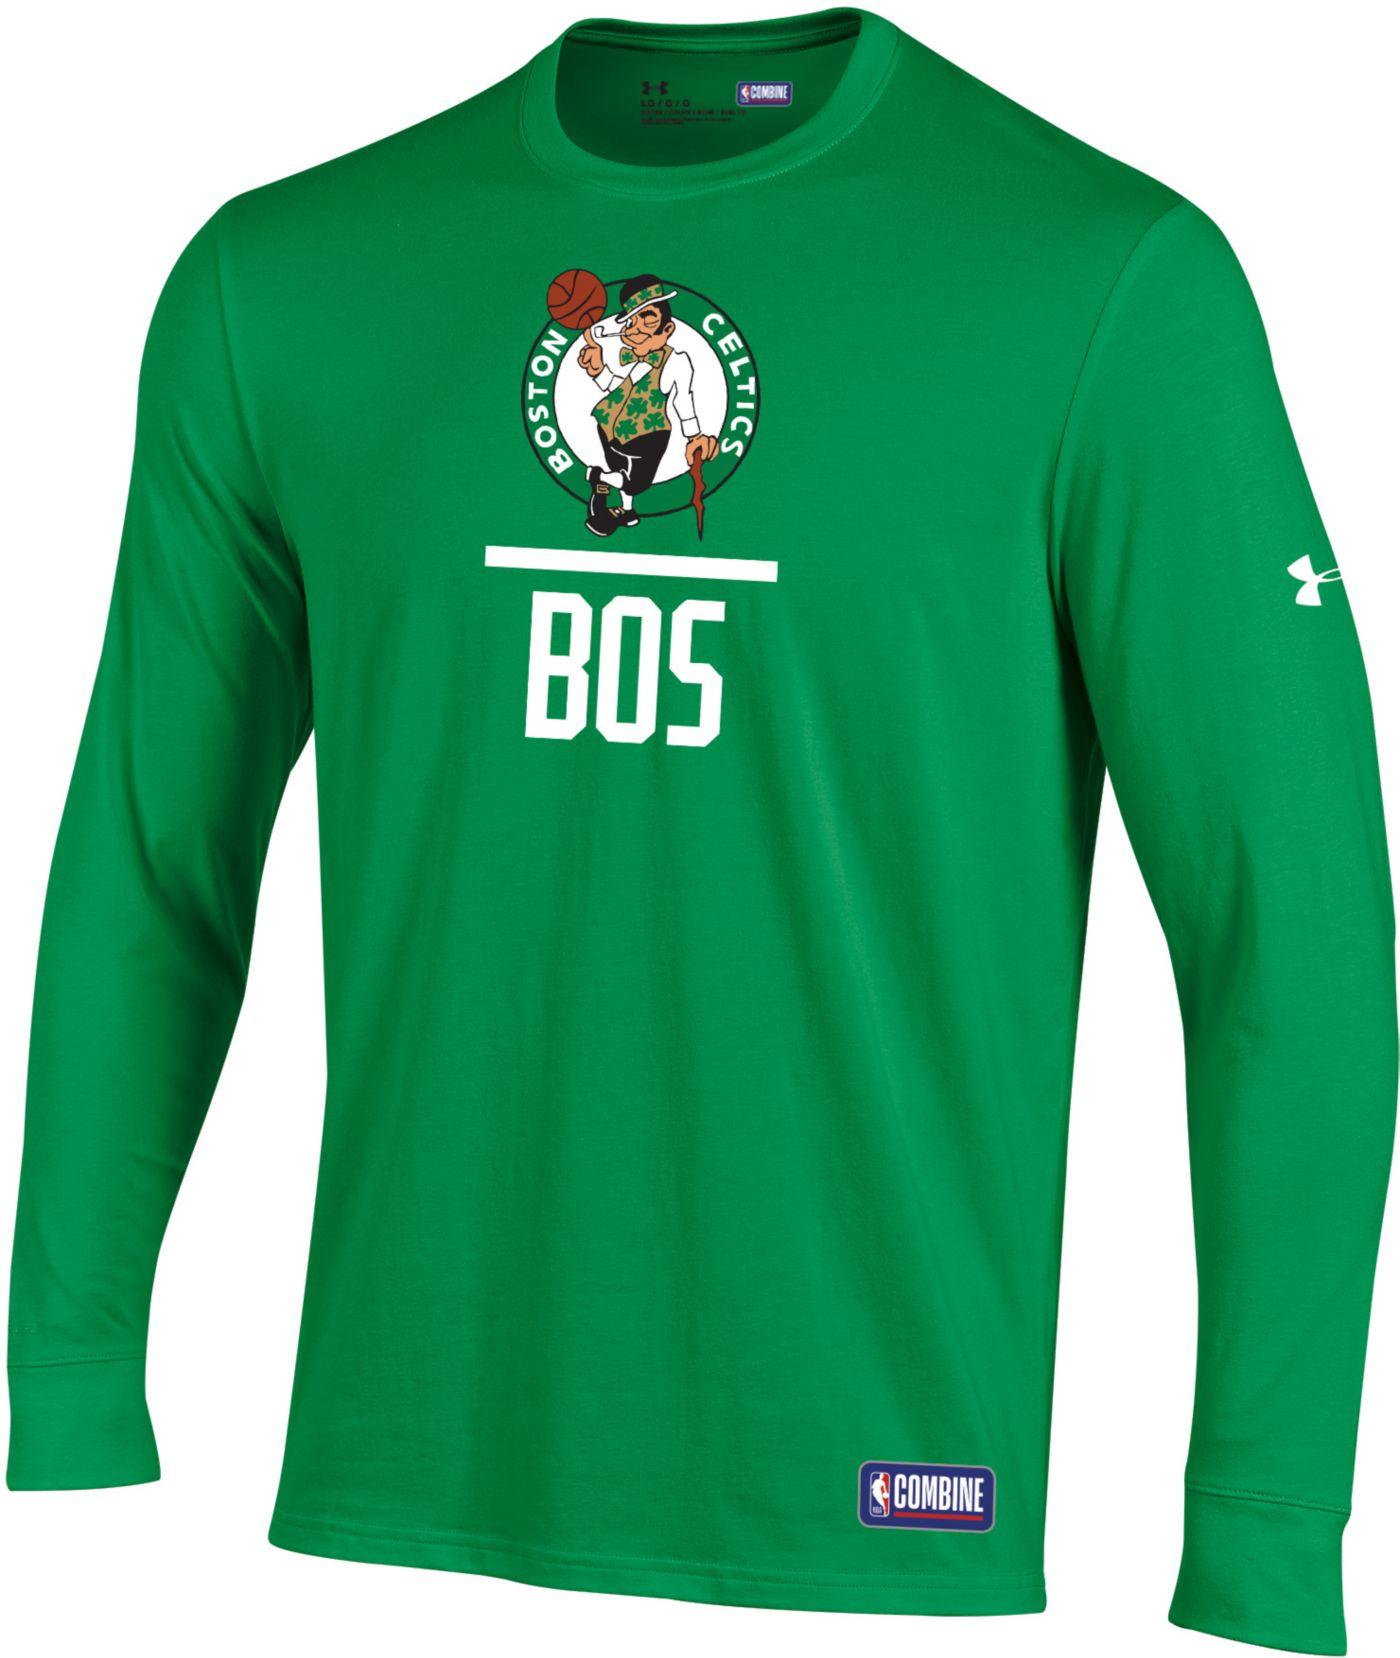 Under Armour Men's Boston Celtics Lockup Long Sleeve Shirt